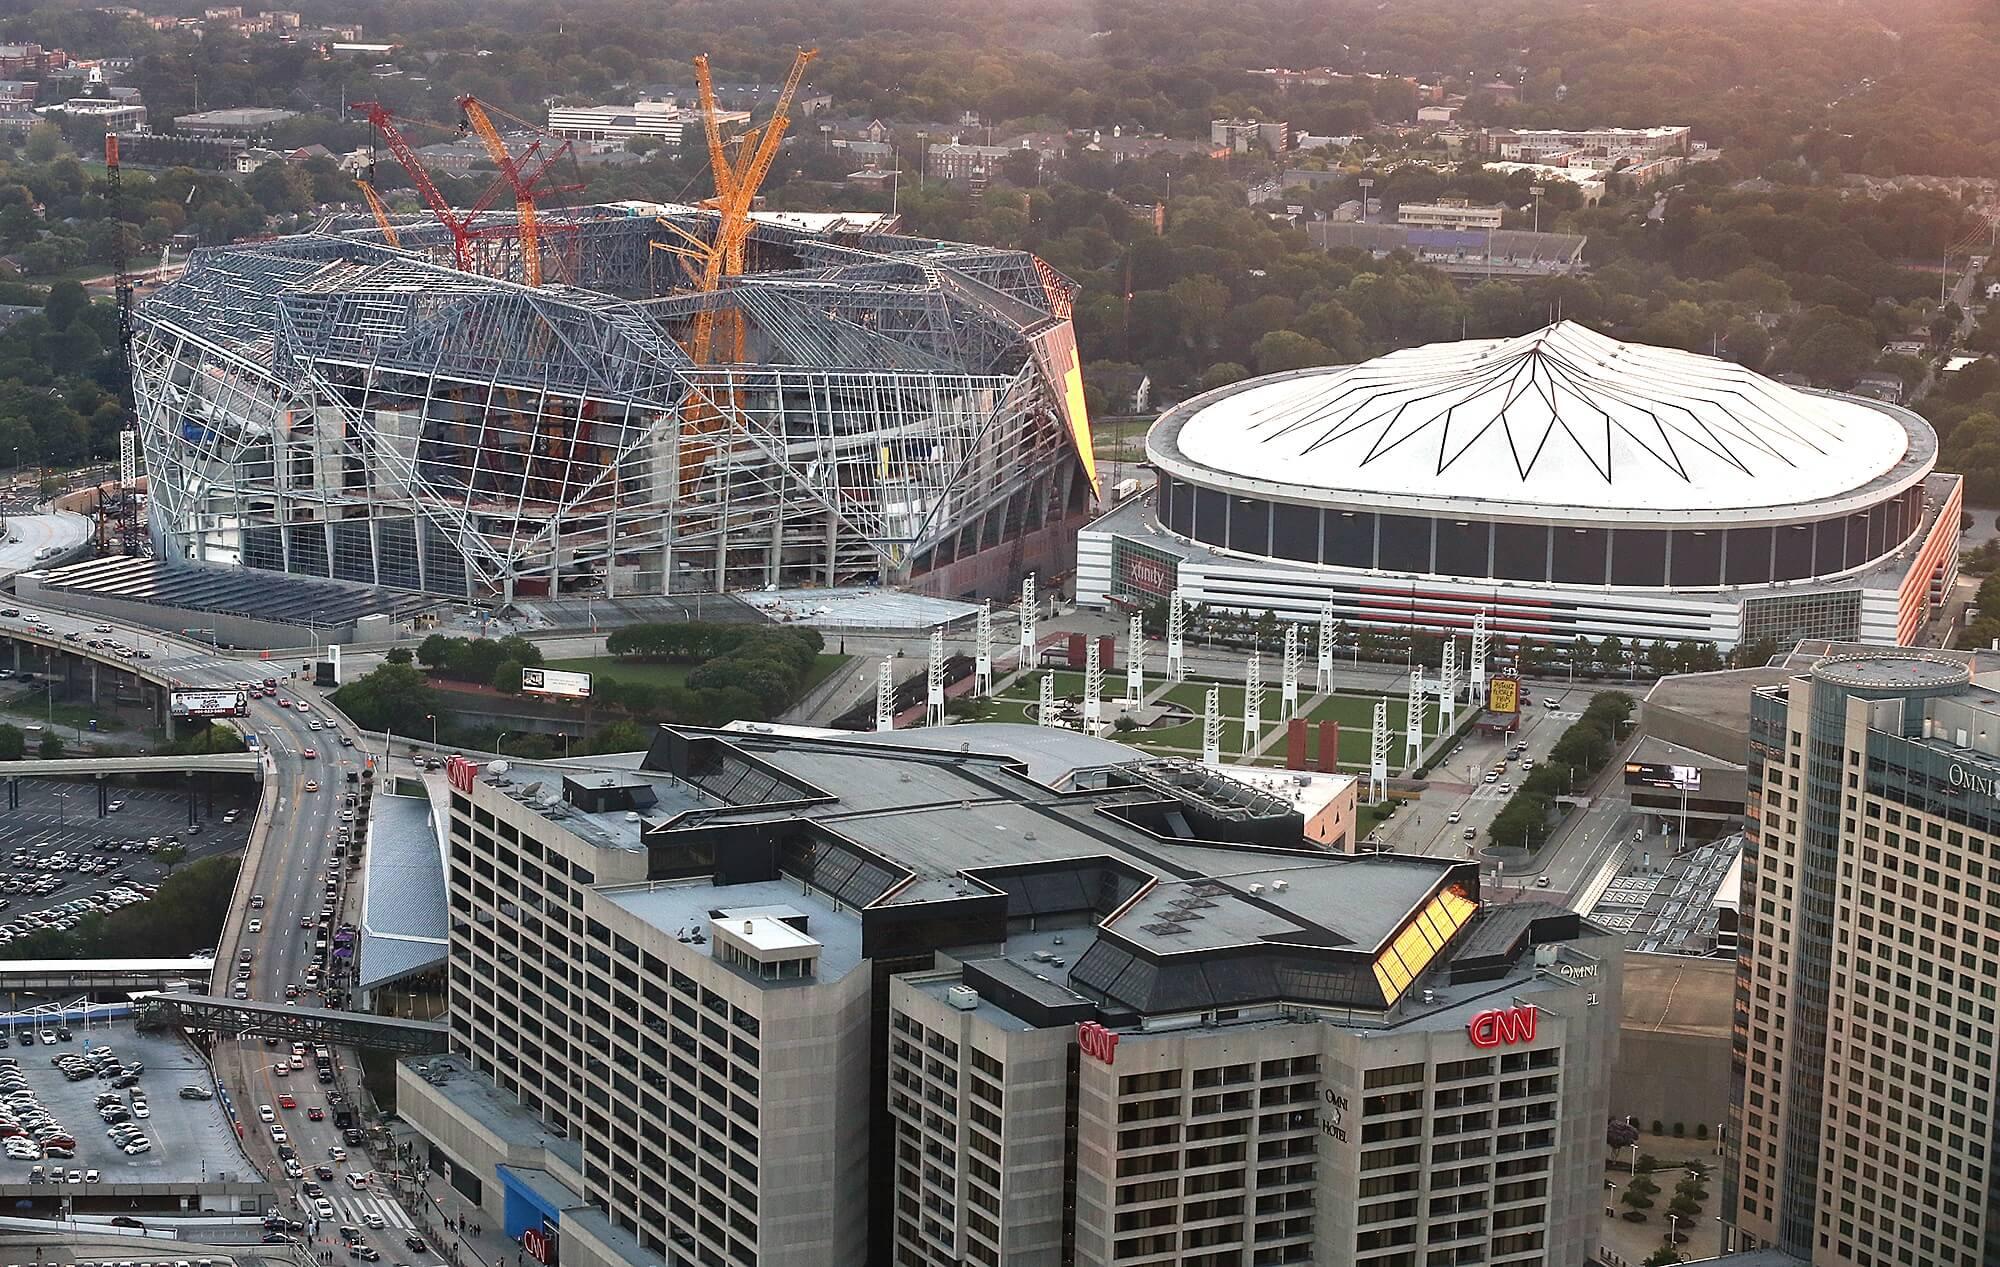 The atlanta falcons new football stadium for Mercedes benz south atlanta service